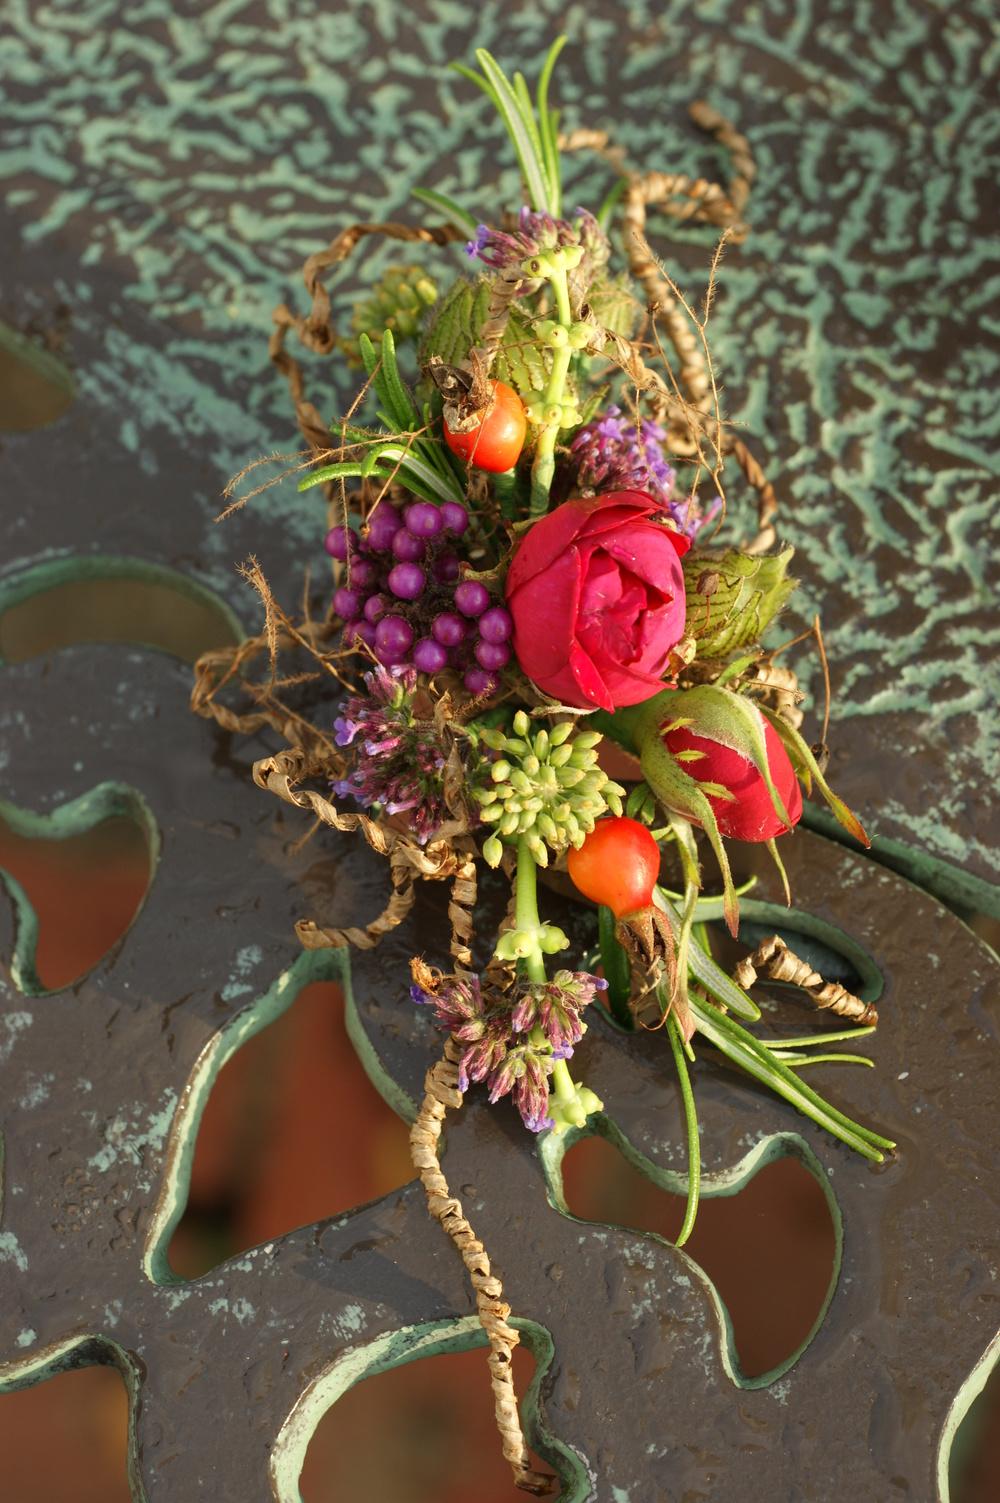 garden and floristry 1 536.JPG